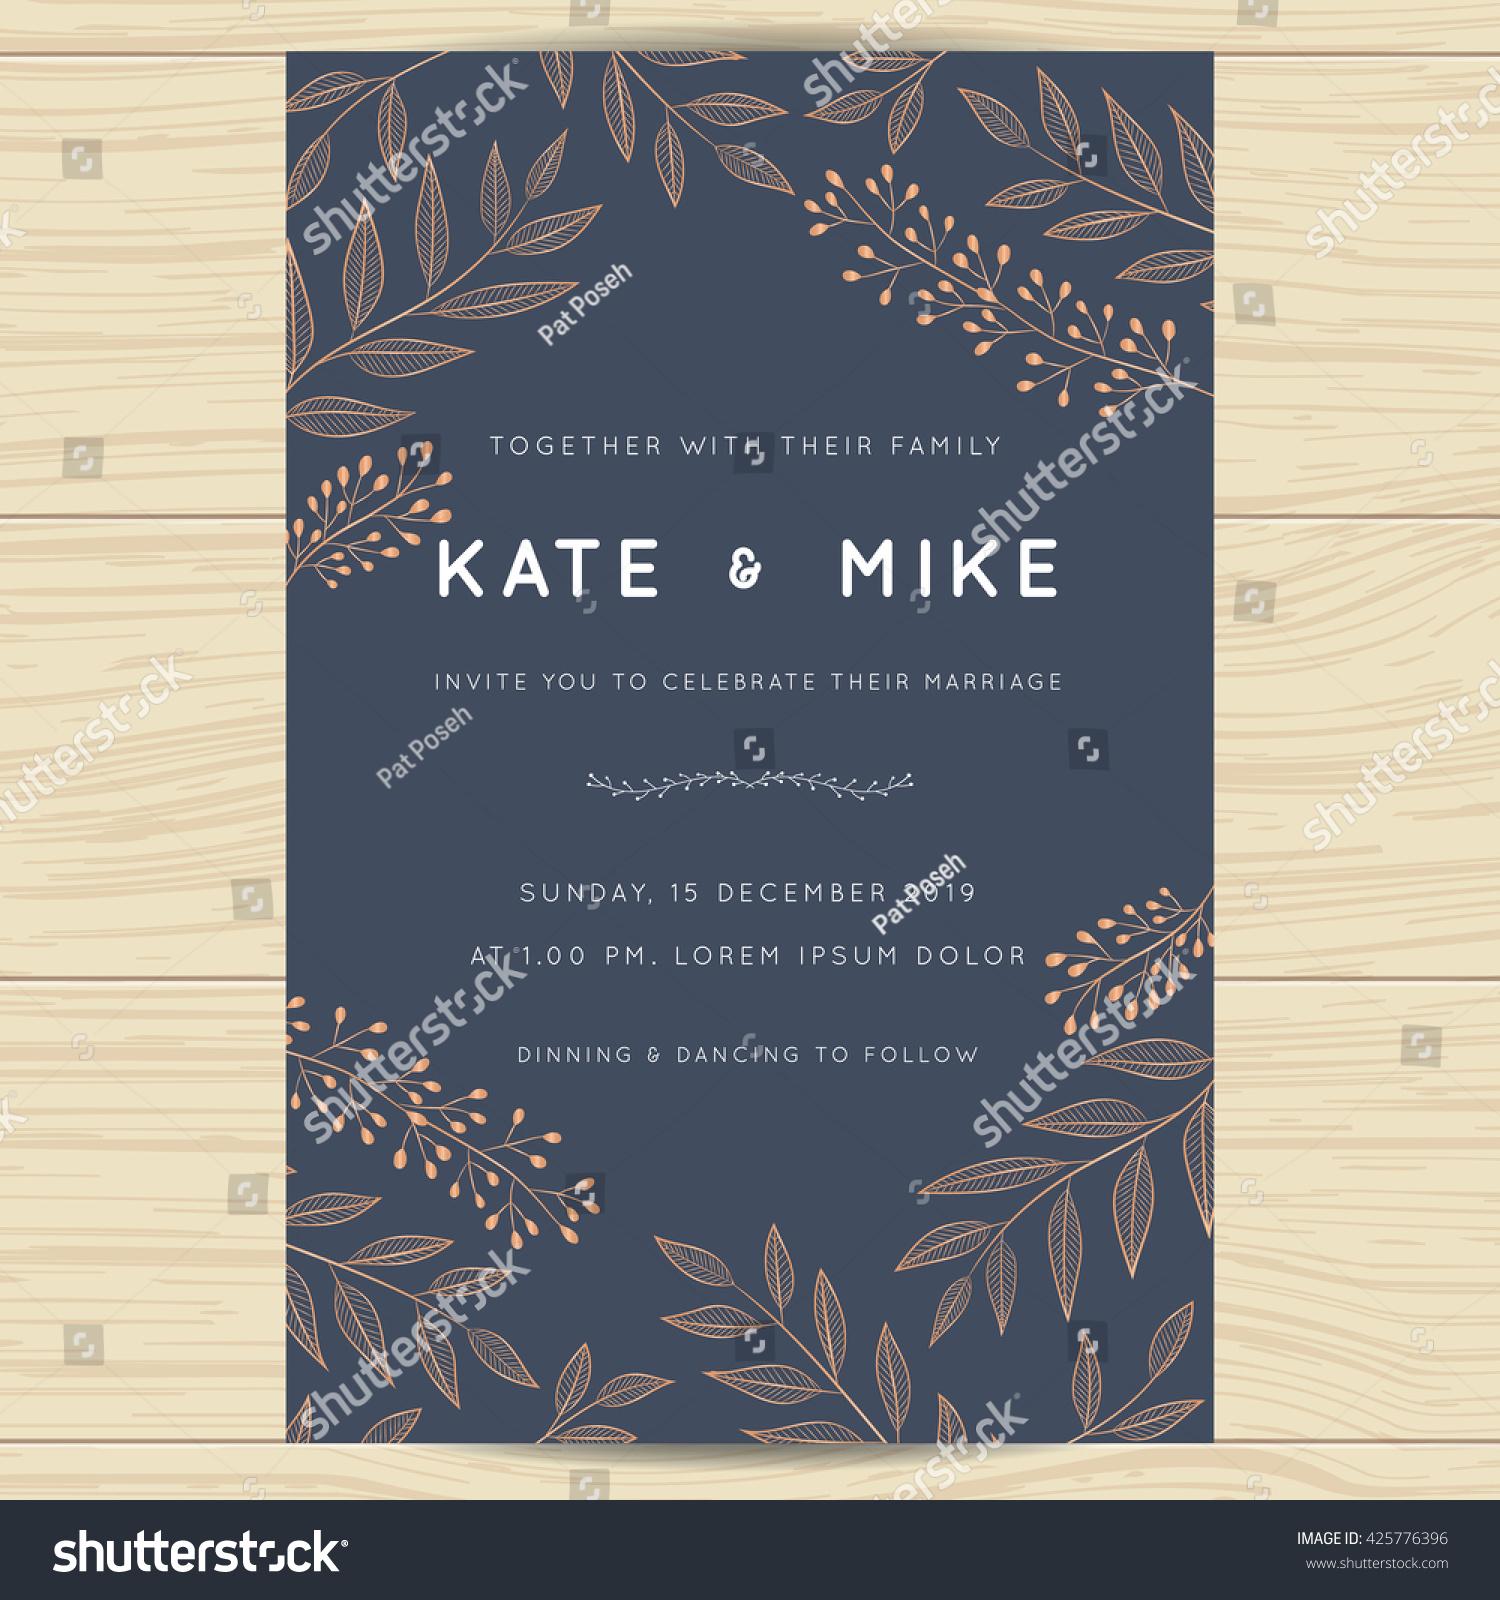 save date wedding invitation card template のベクター画像素材